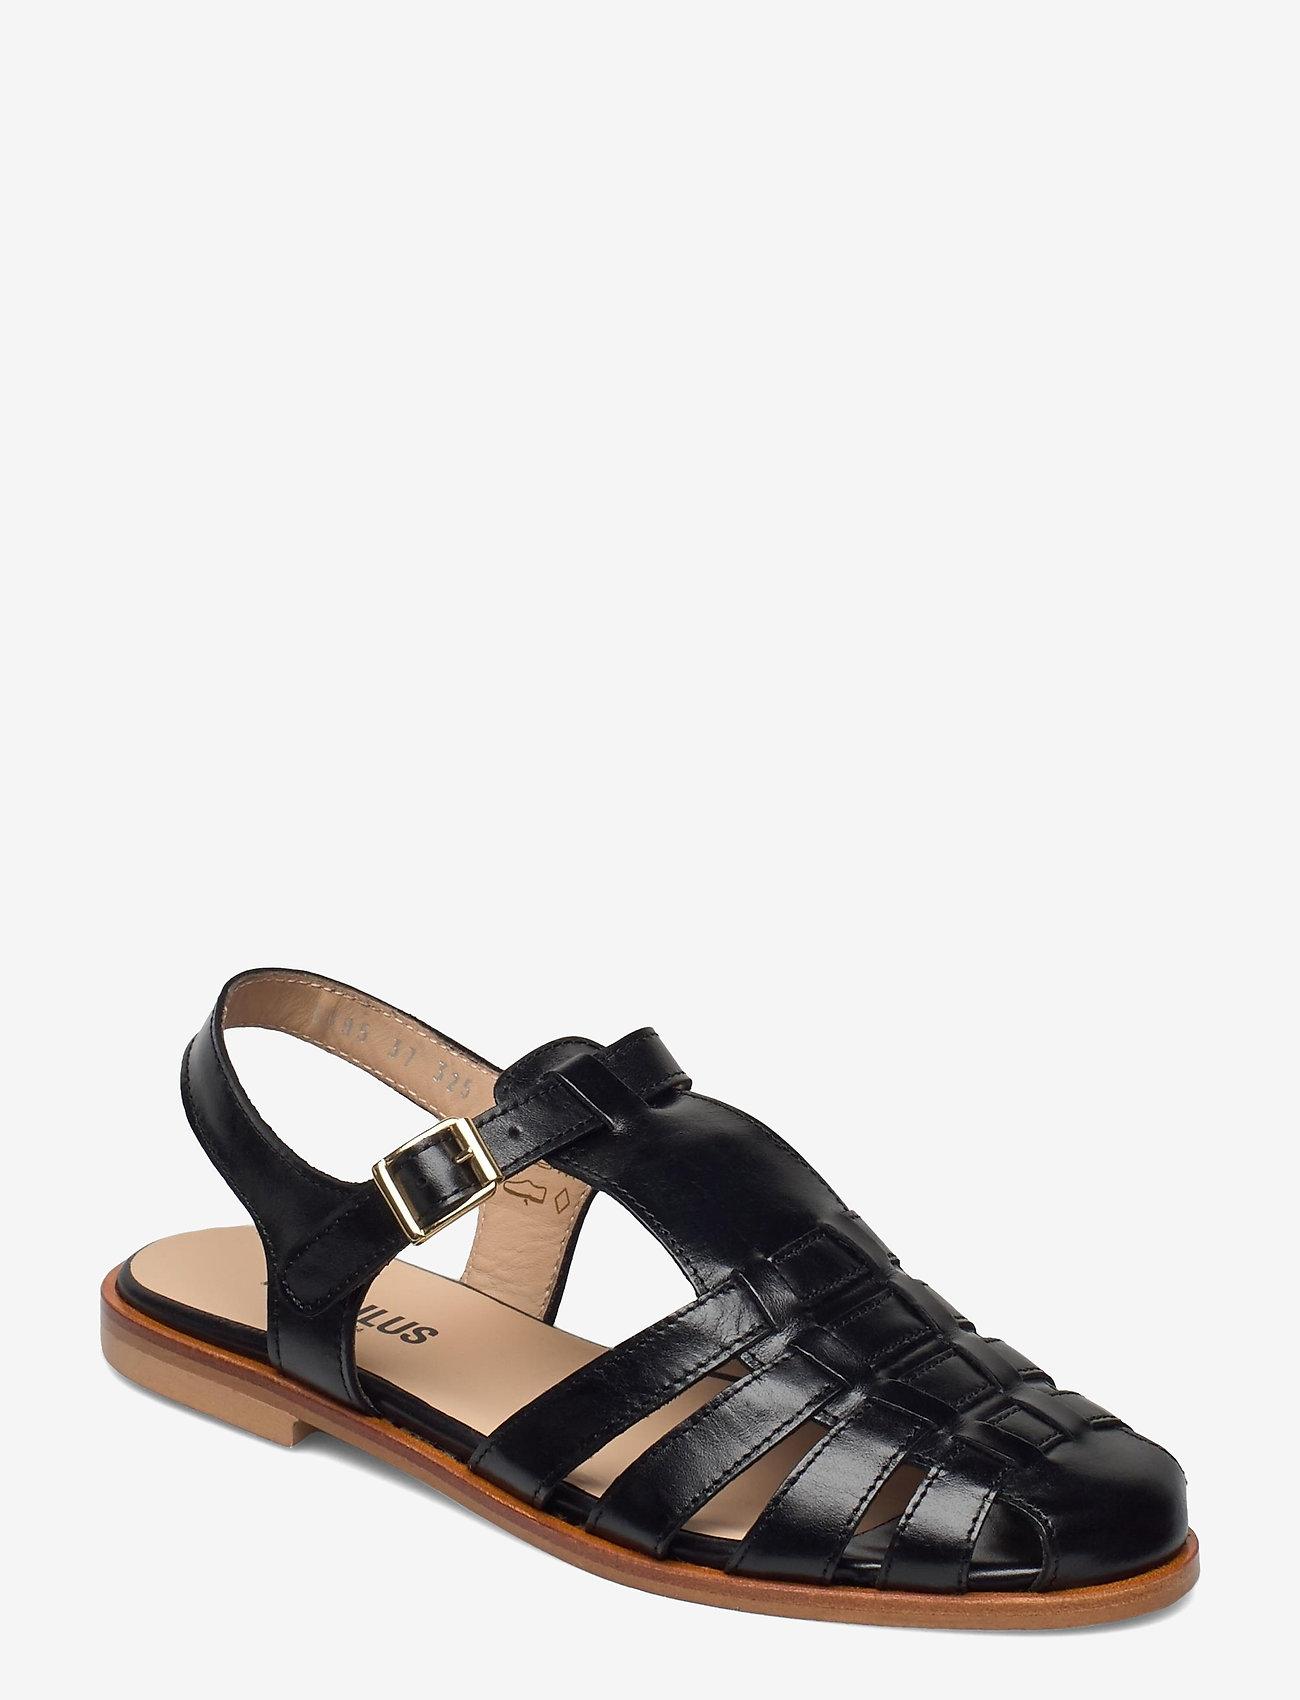 ANGULUS - Sandals - flat - closed toe - op - flache sandalen - 1835 black - 0